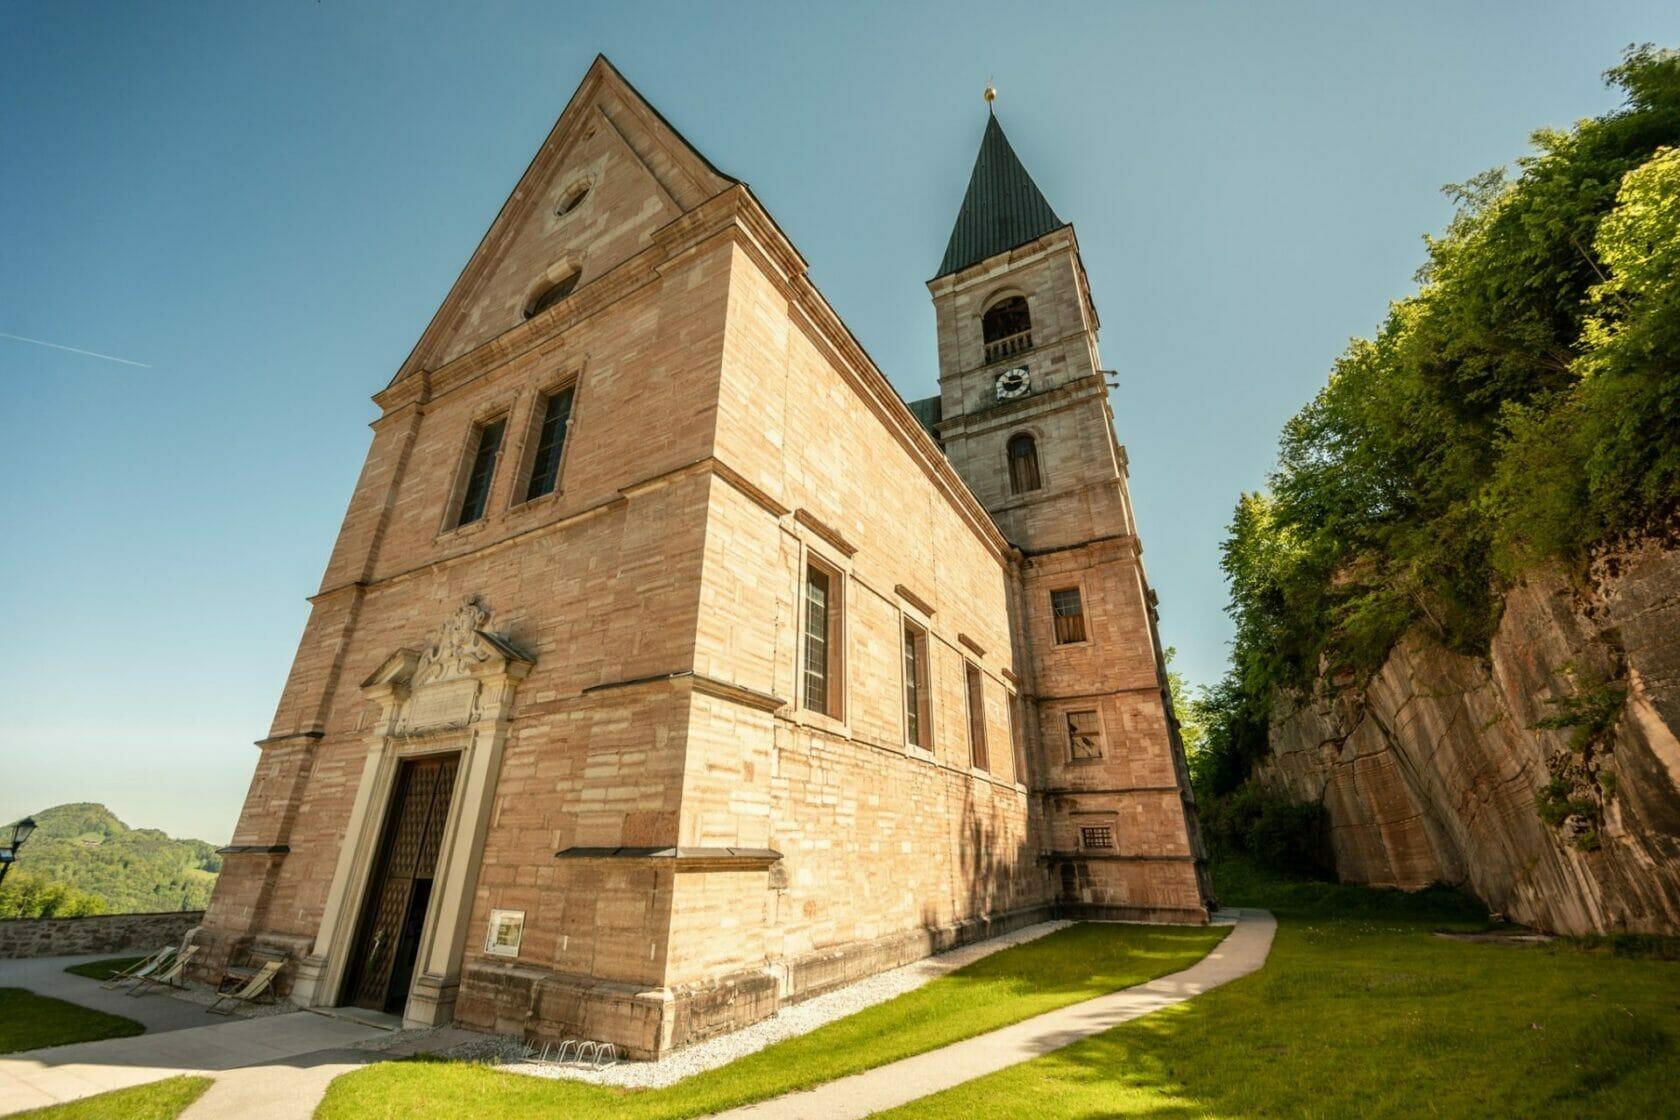 Wallfahrtskirche Dürrnberg